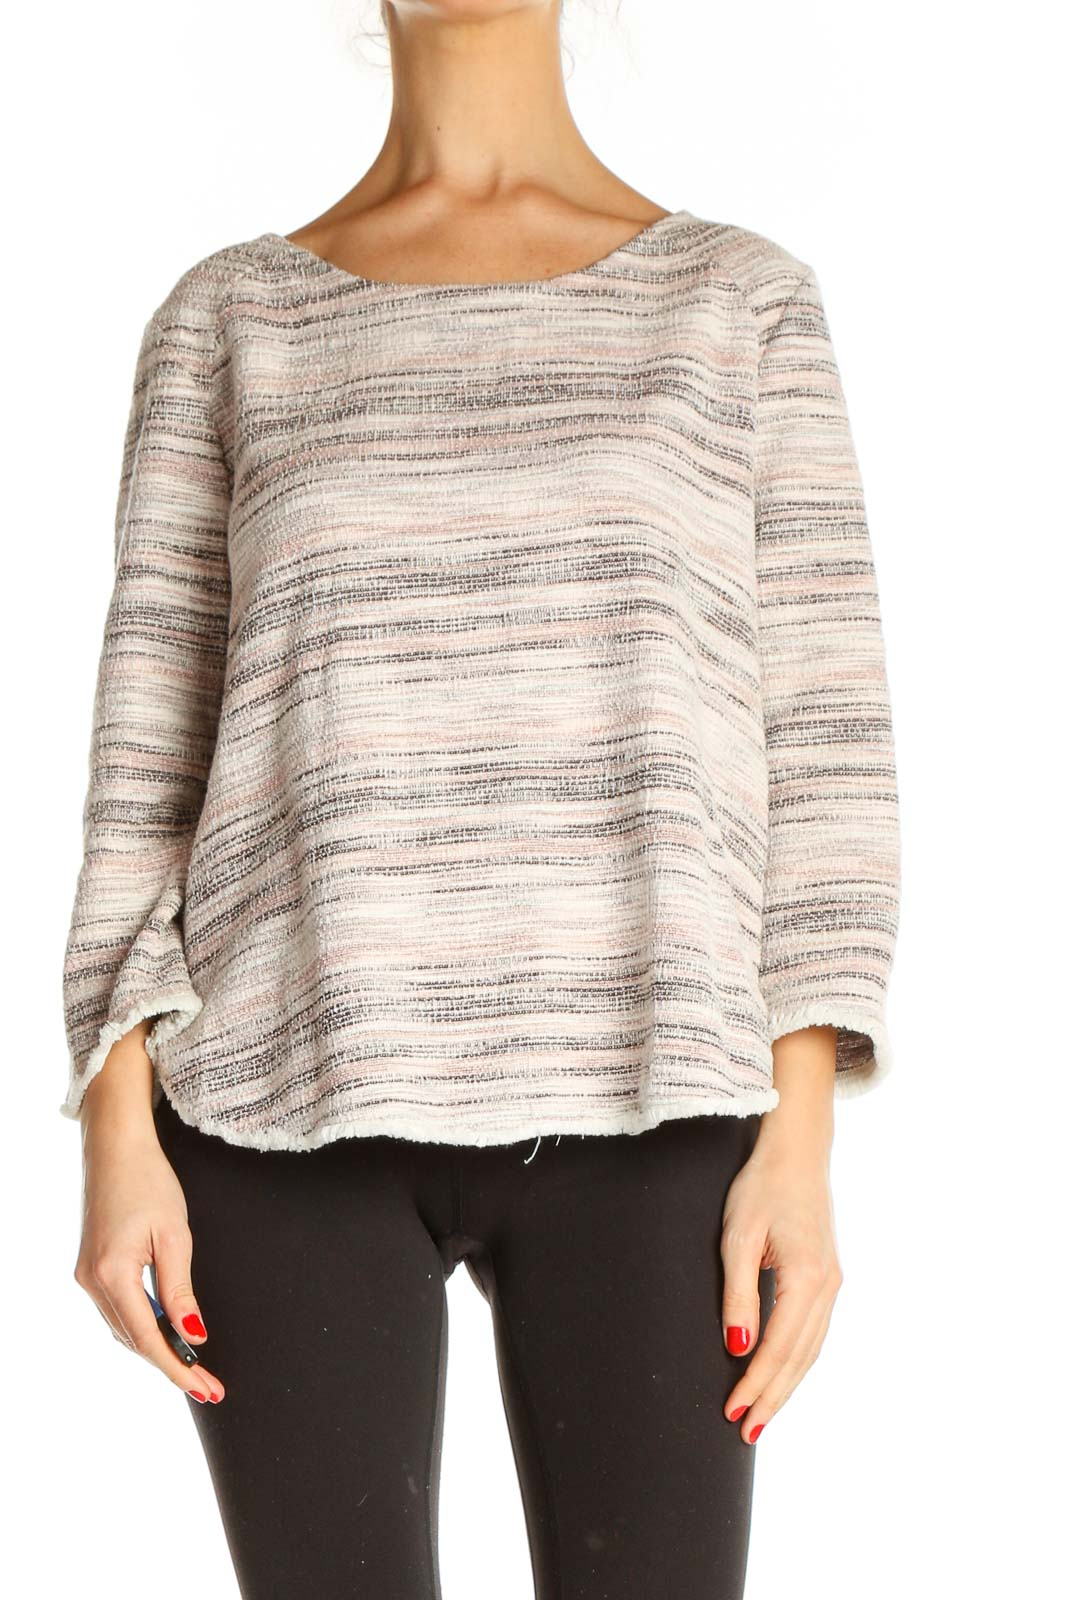 Beige Striped All Day Wear Sweater Front